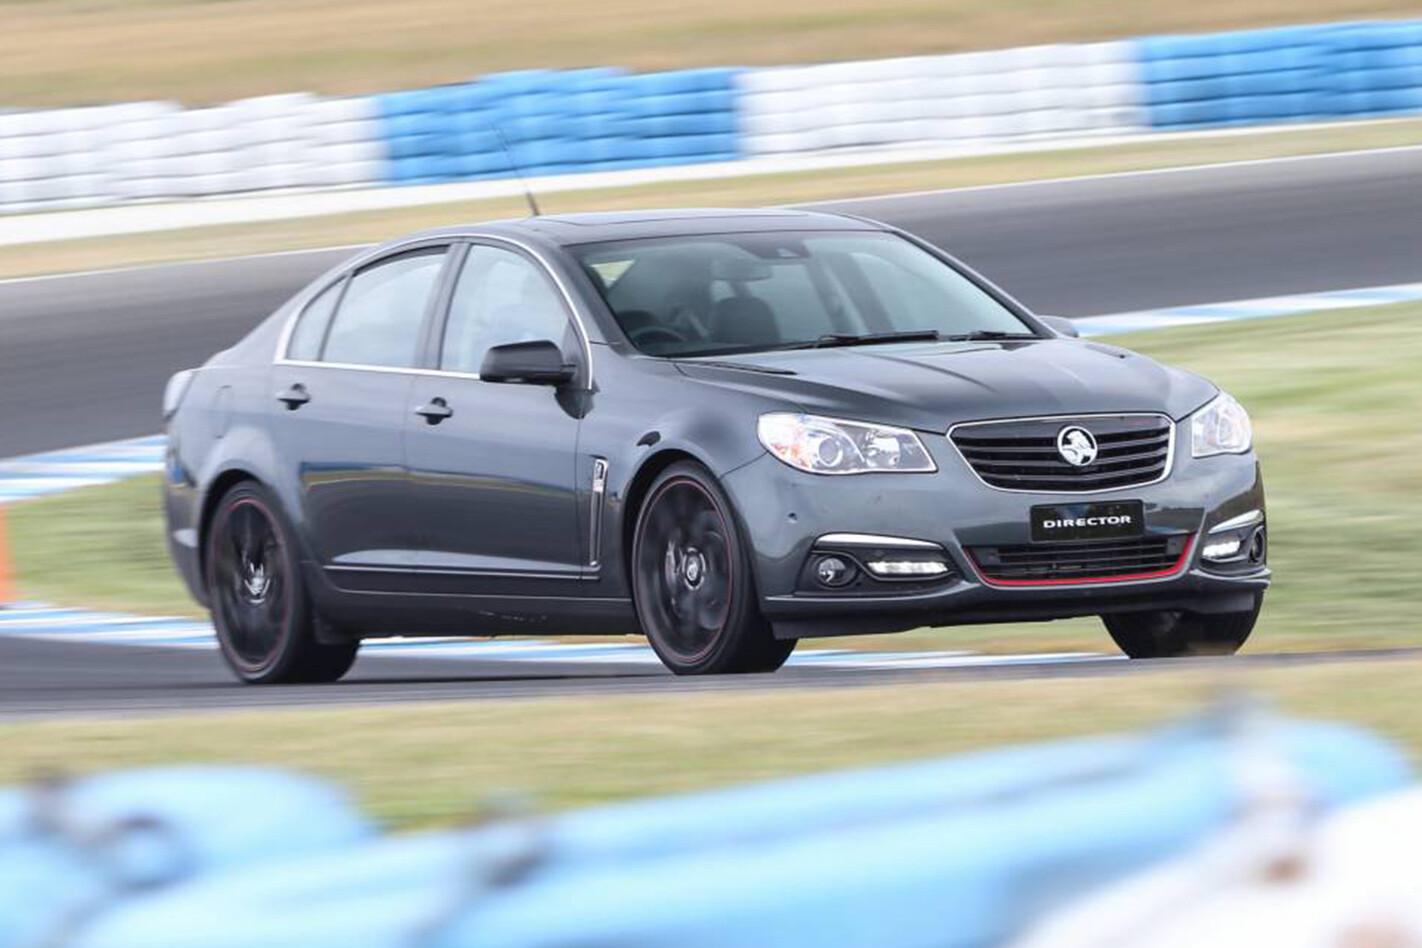 2017-Holden-Director-sedan-front.jpg